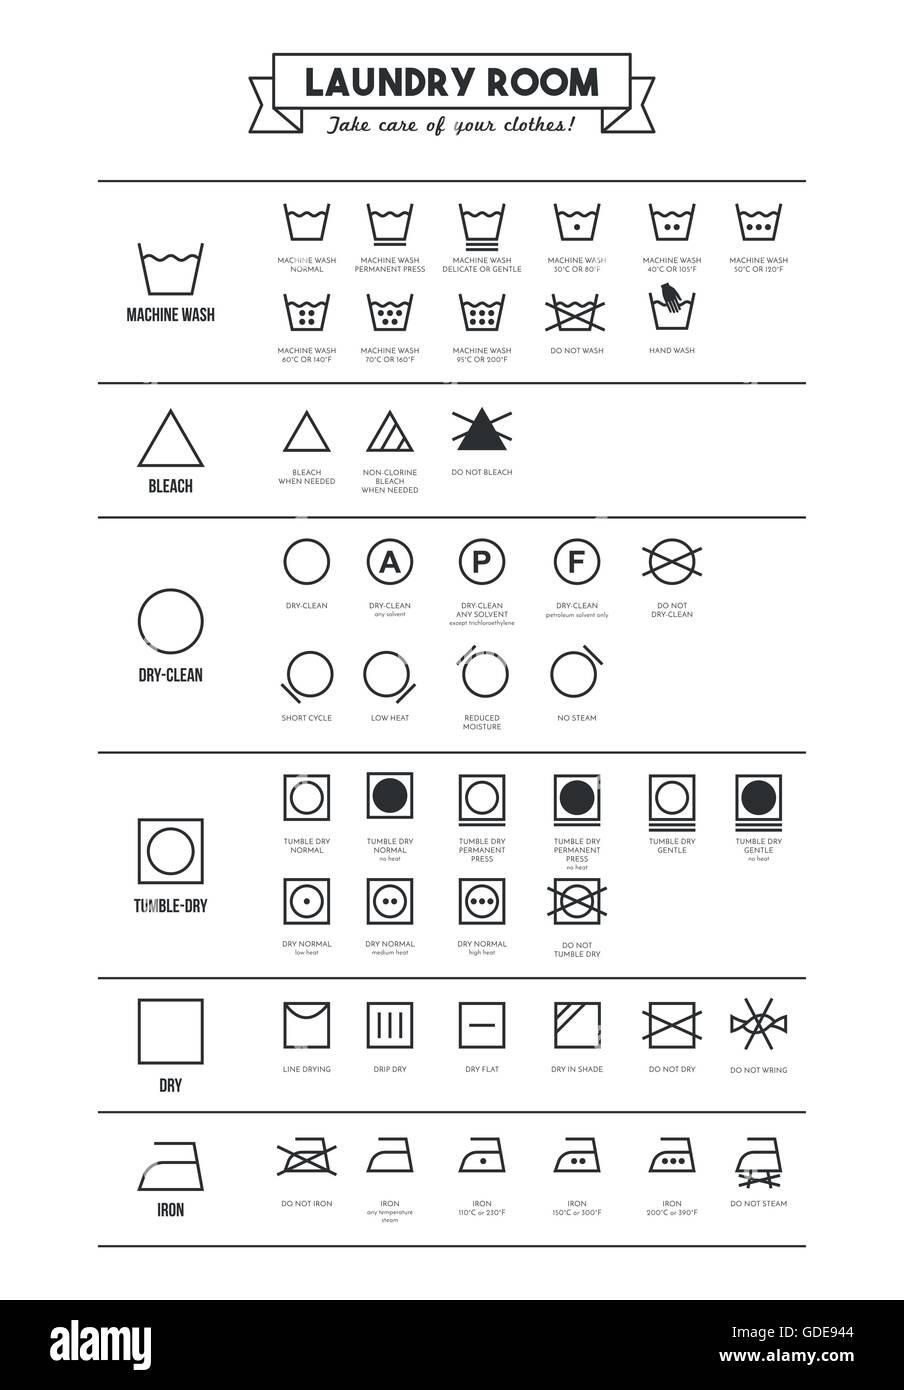 Laundry Care Symbol Stock Photos Laundry Care Symbol Stock Images